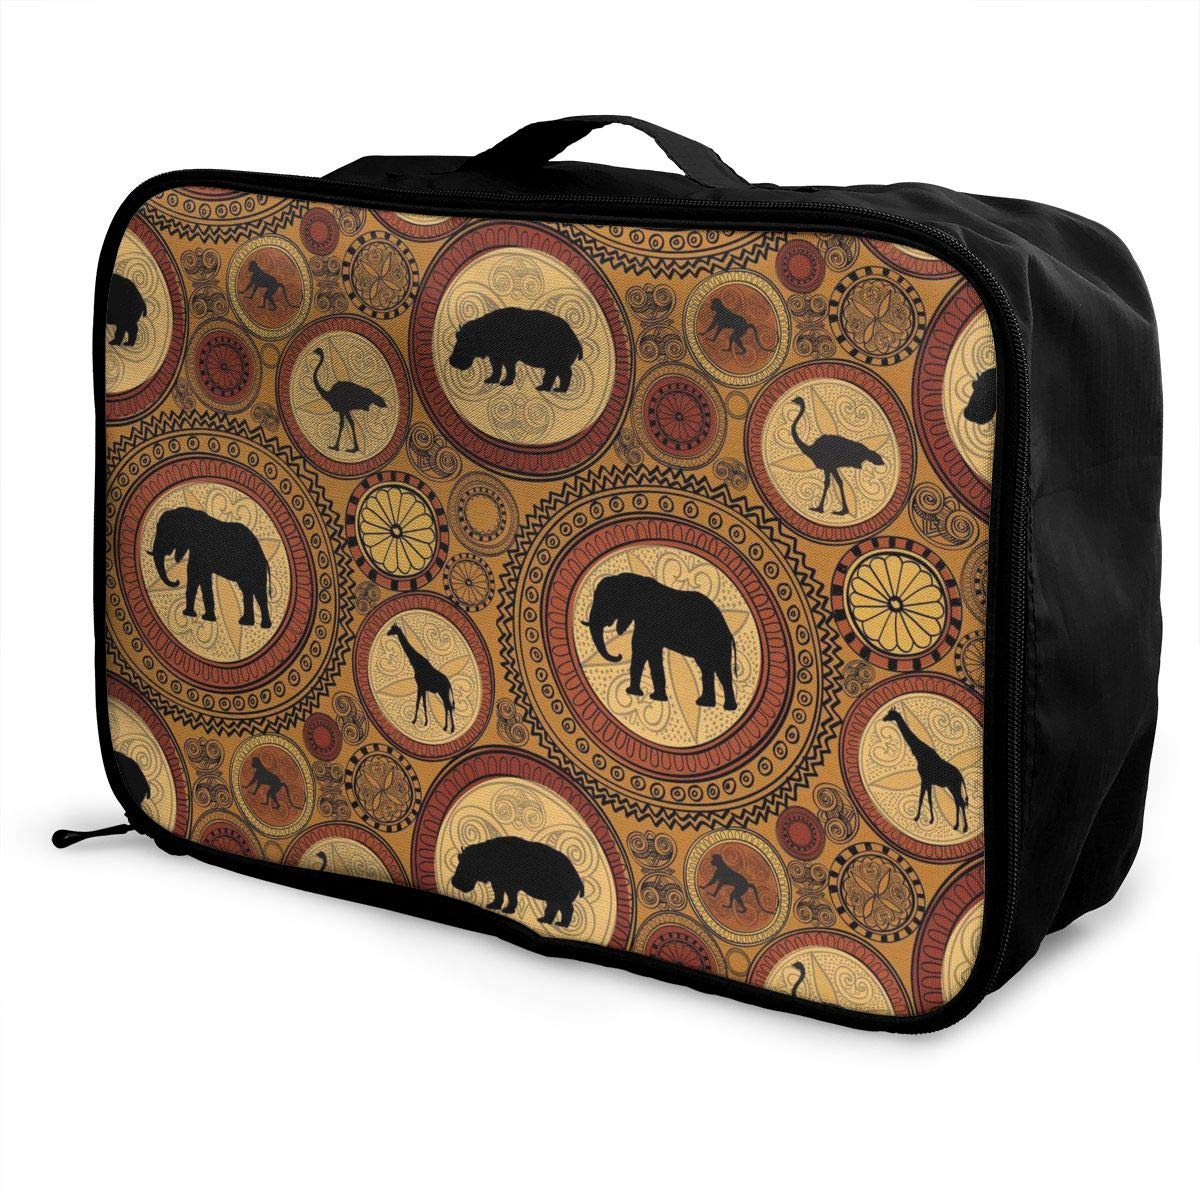 ADGAI African Ethnic Animals Elephant Canvas Travel Weekender Bag,Fashion Custom Lightweight Large Capacity Portable Luggage Bag,Suitcase Trolley Bag